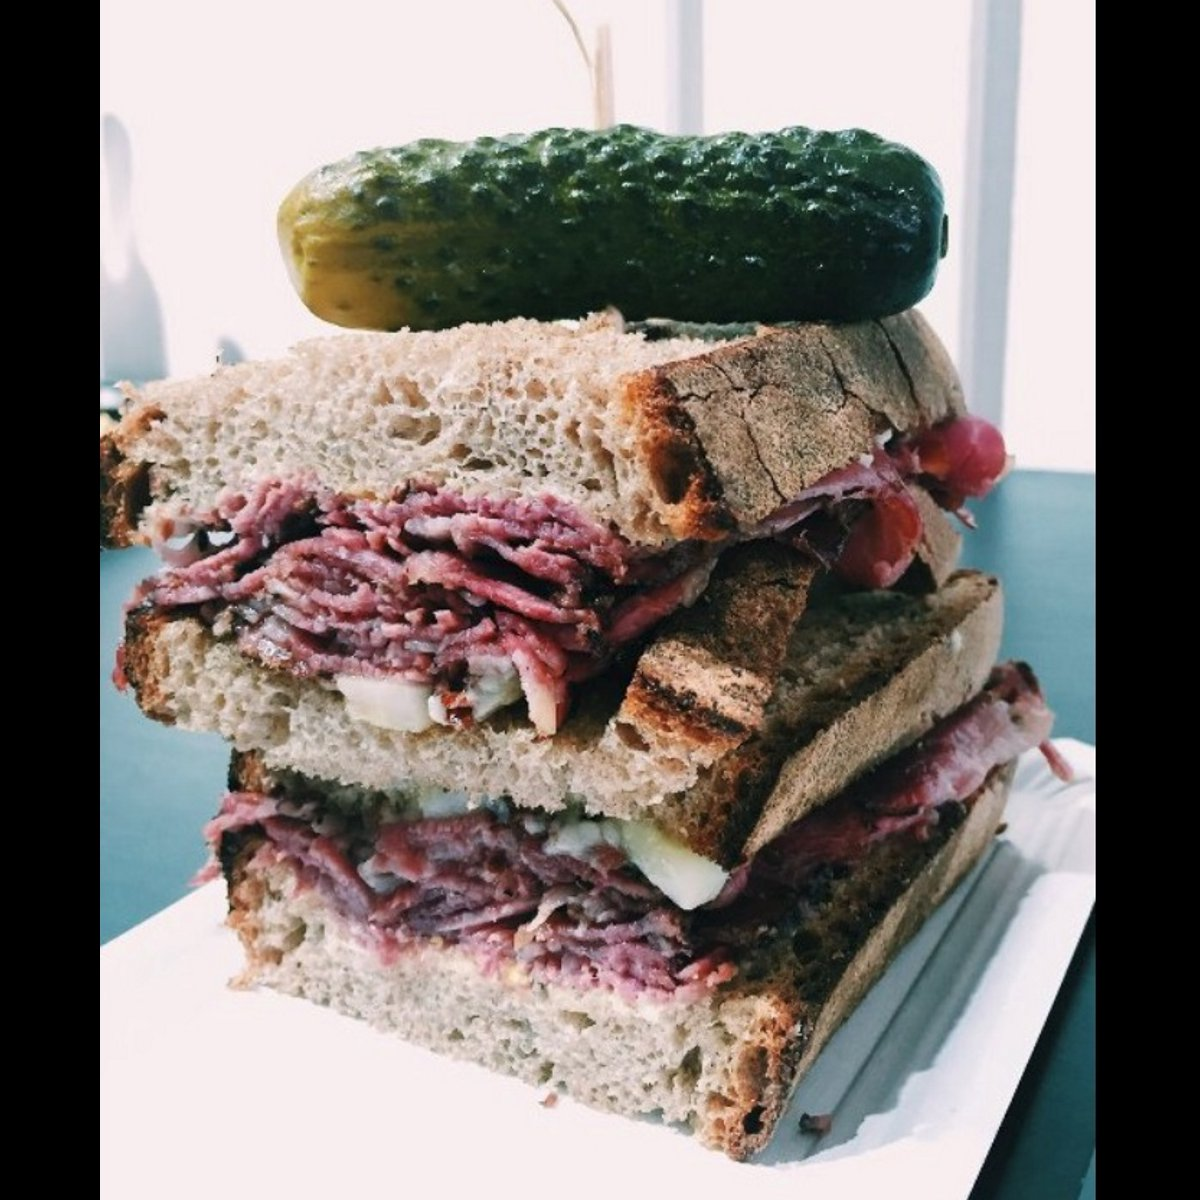 Best_Pastrami_Sandwich